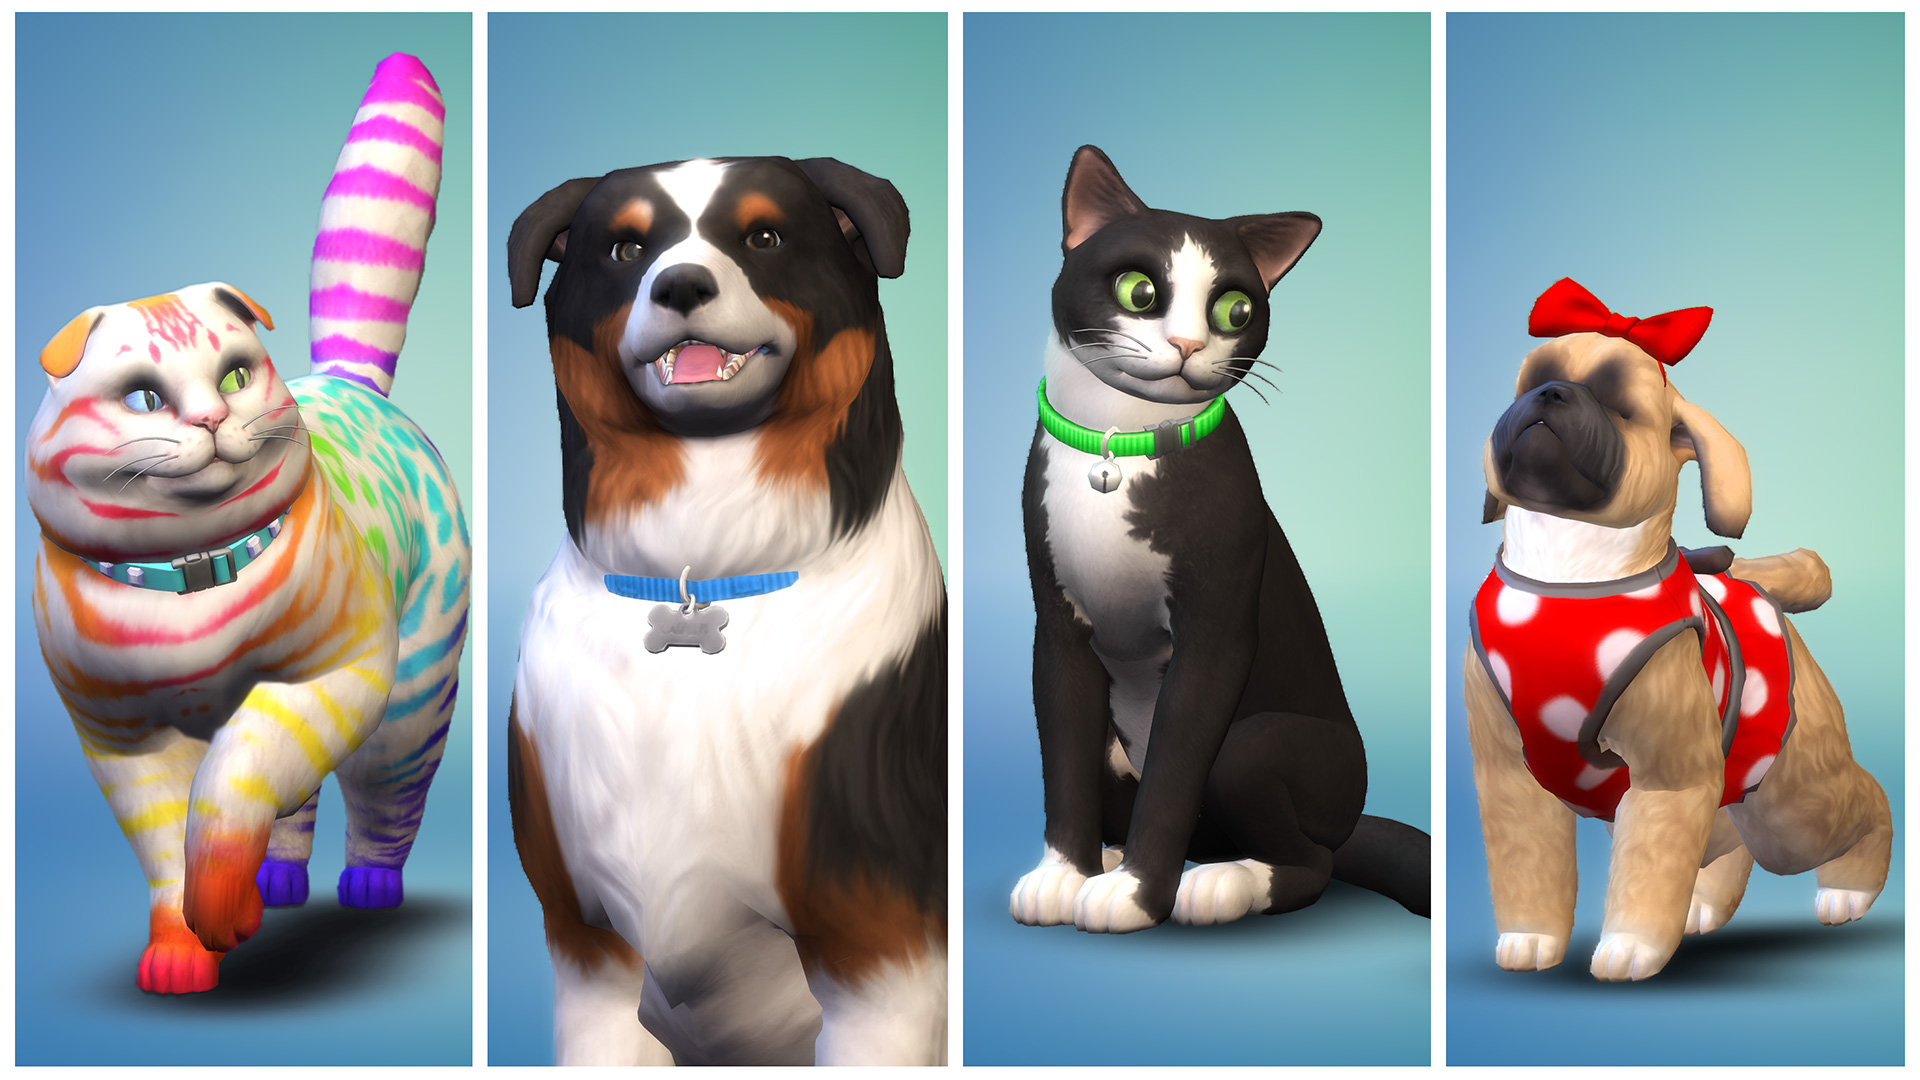 Endearing Coole Haustiere Photo Of Die Sims 4: Hunde Und Katzen